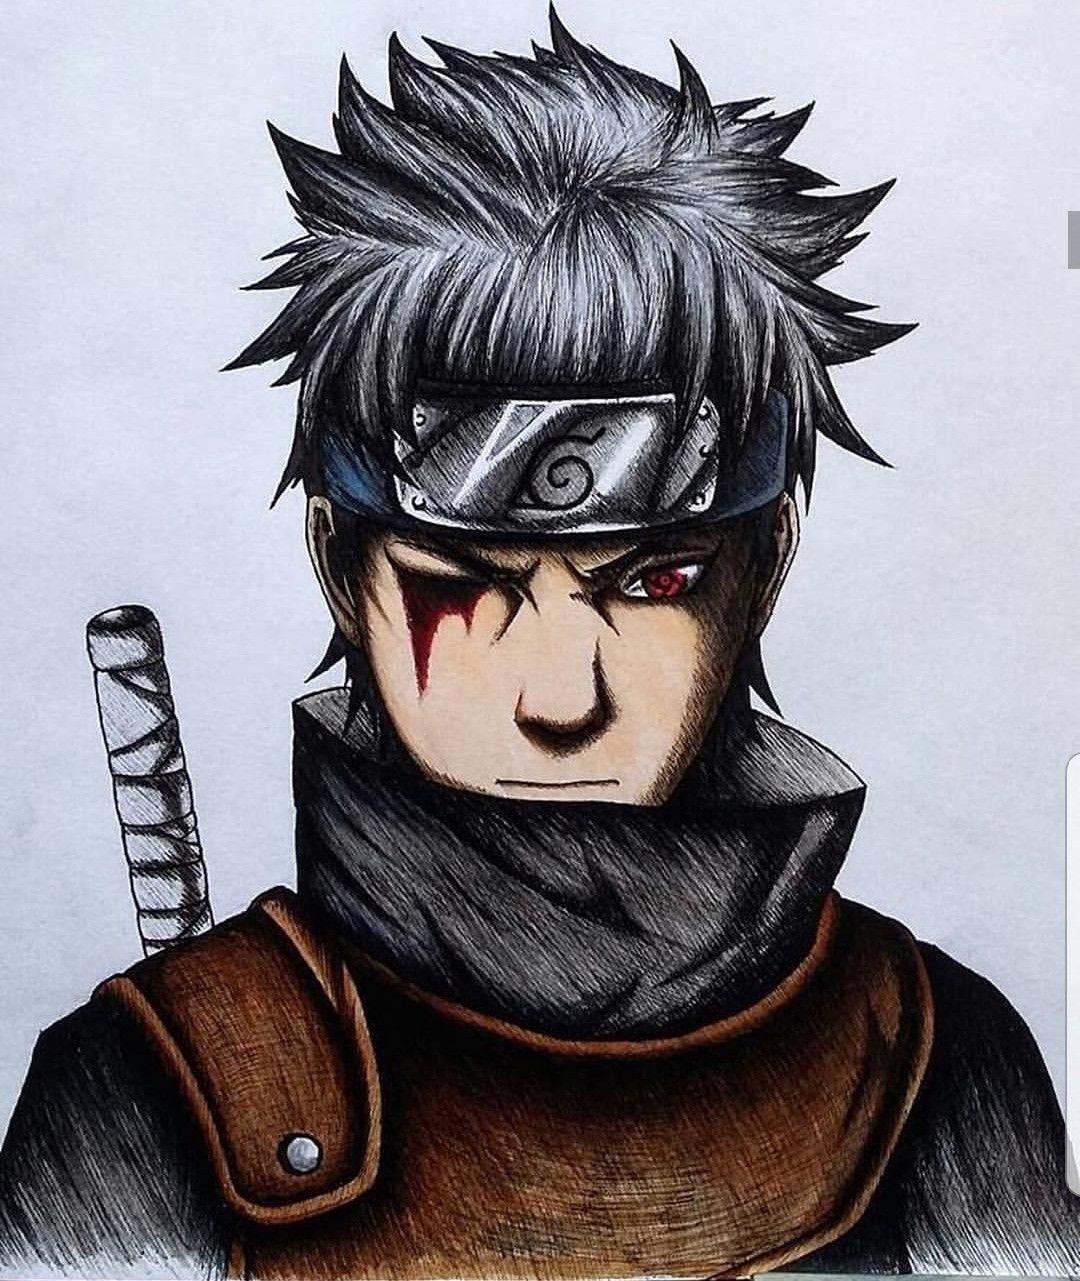 Anime & Cartoons image by Mirian L. Naruto drawings